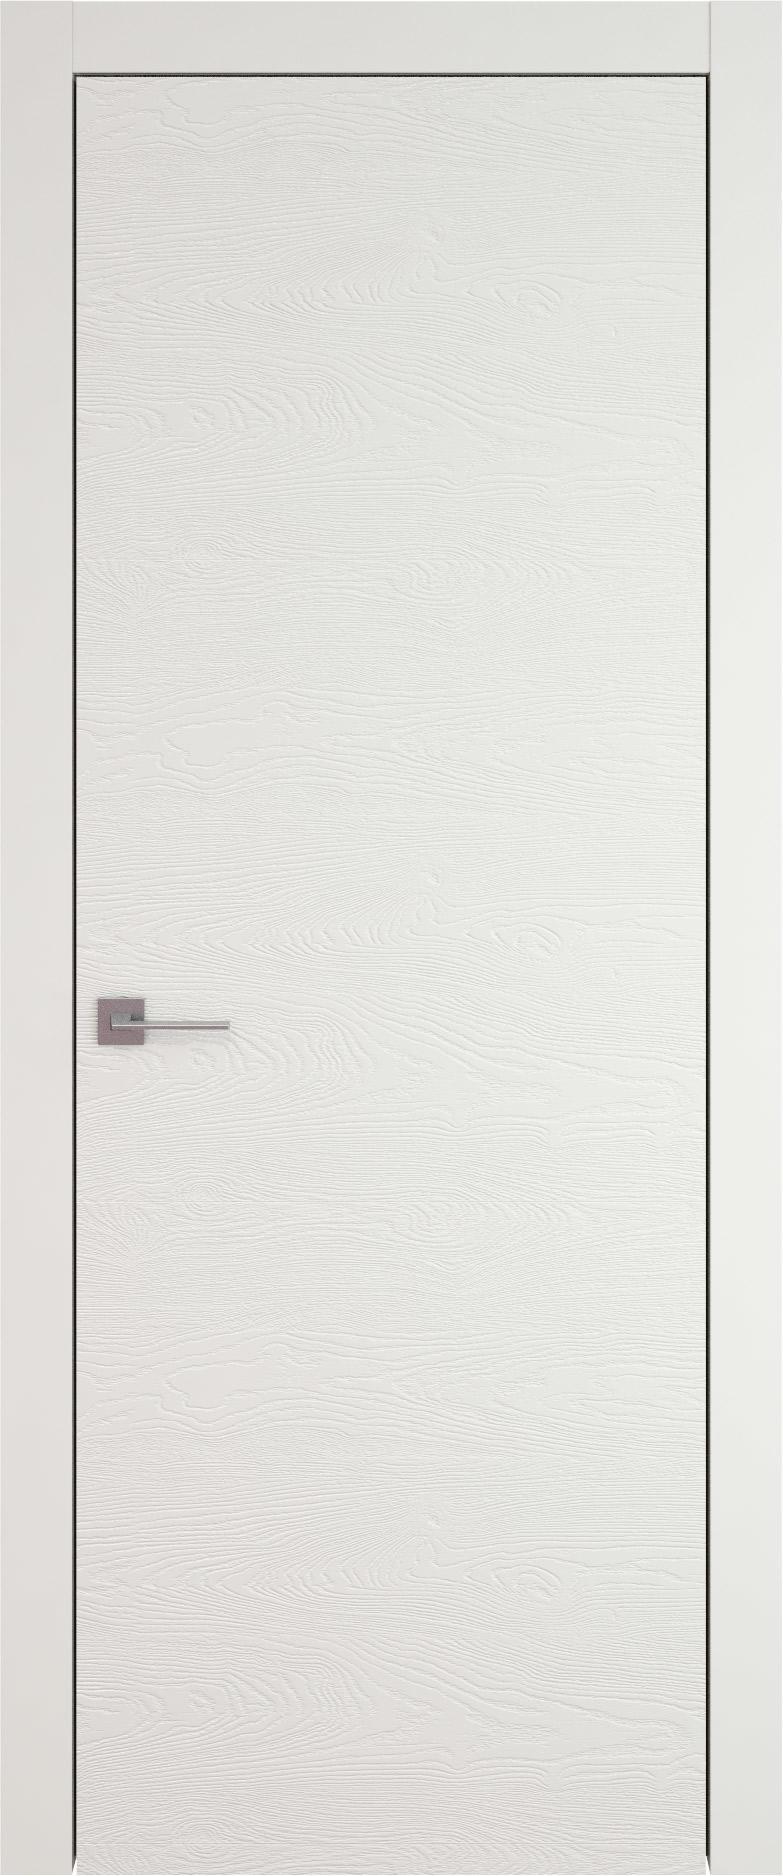 Tivoli А-5 цвет - Бежевая эмаль по шпону (RAL 9010) Без стекла (ДГ)